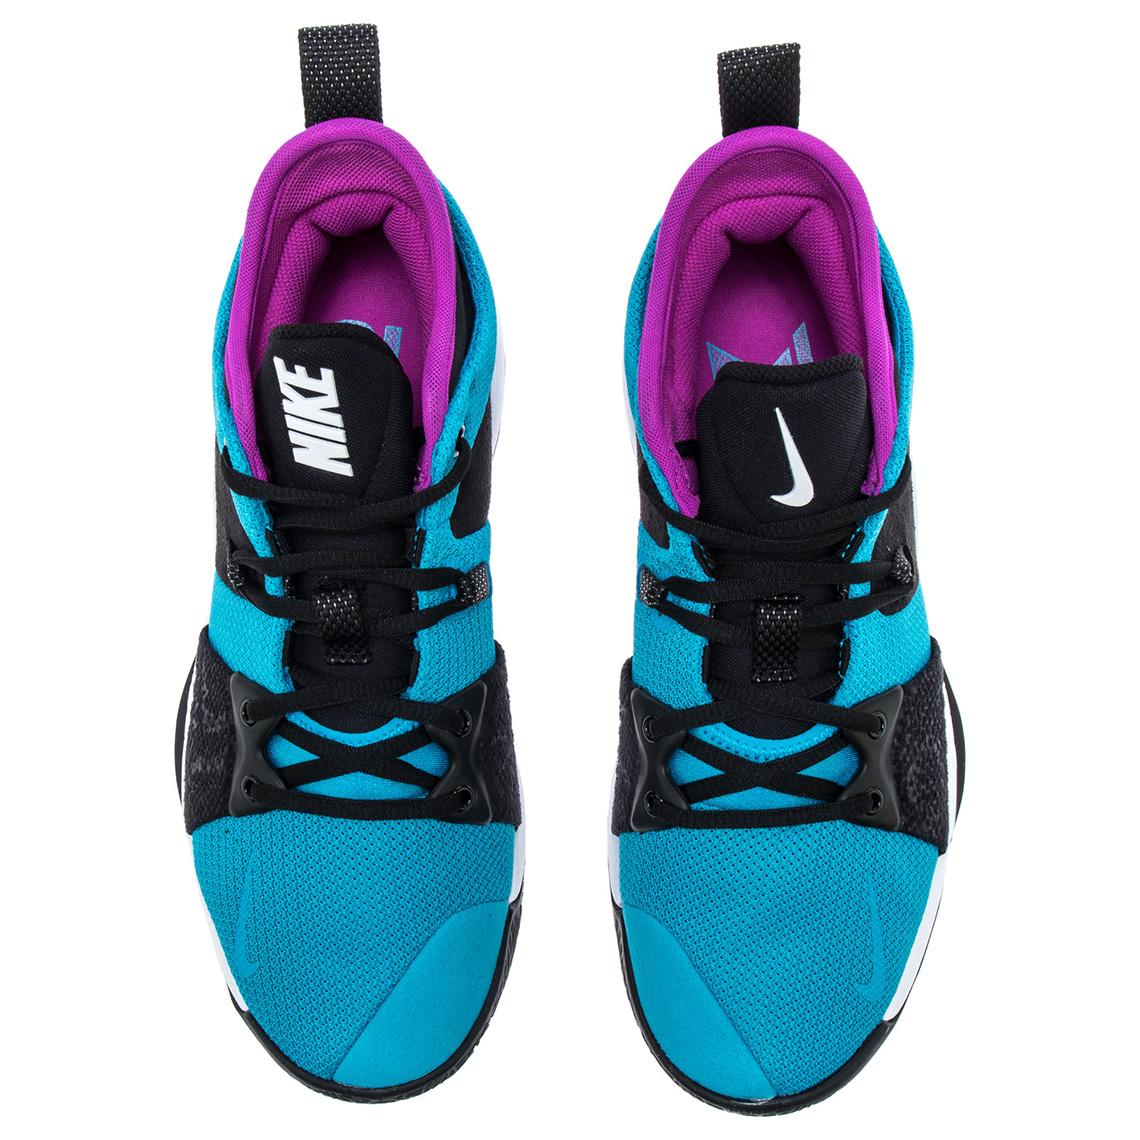 43bdc163ffd5 Nike PG 2